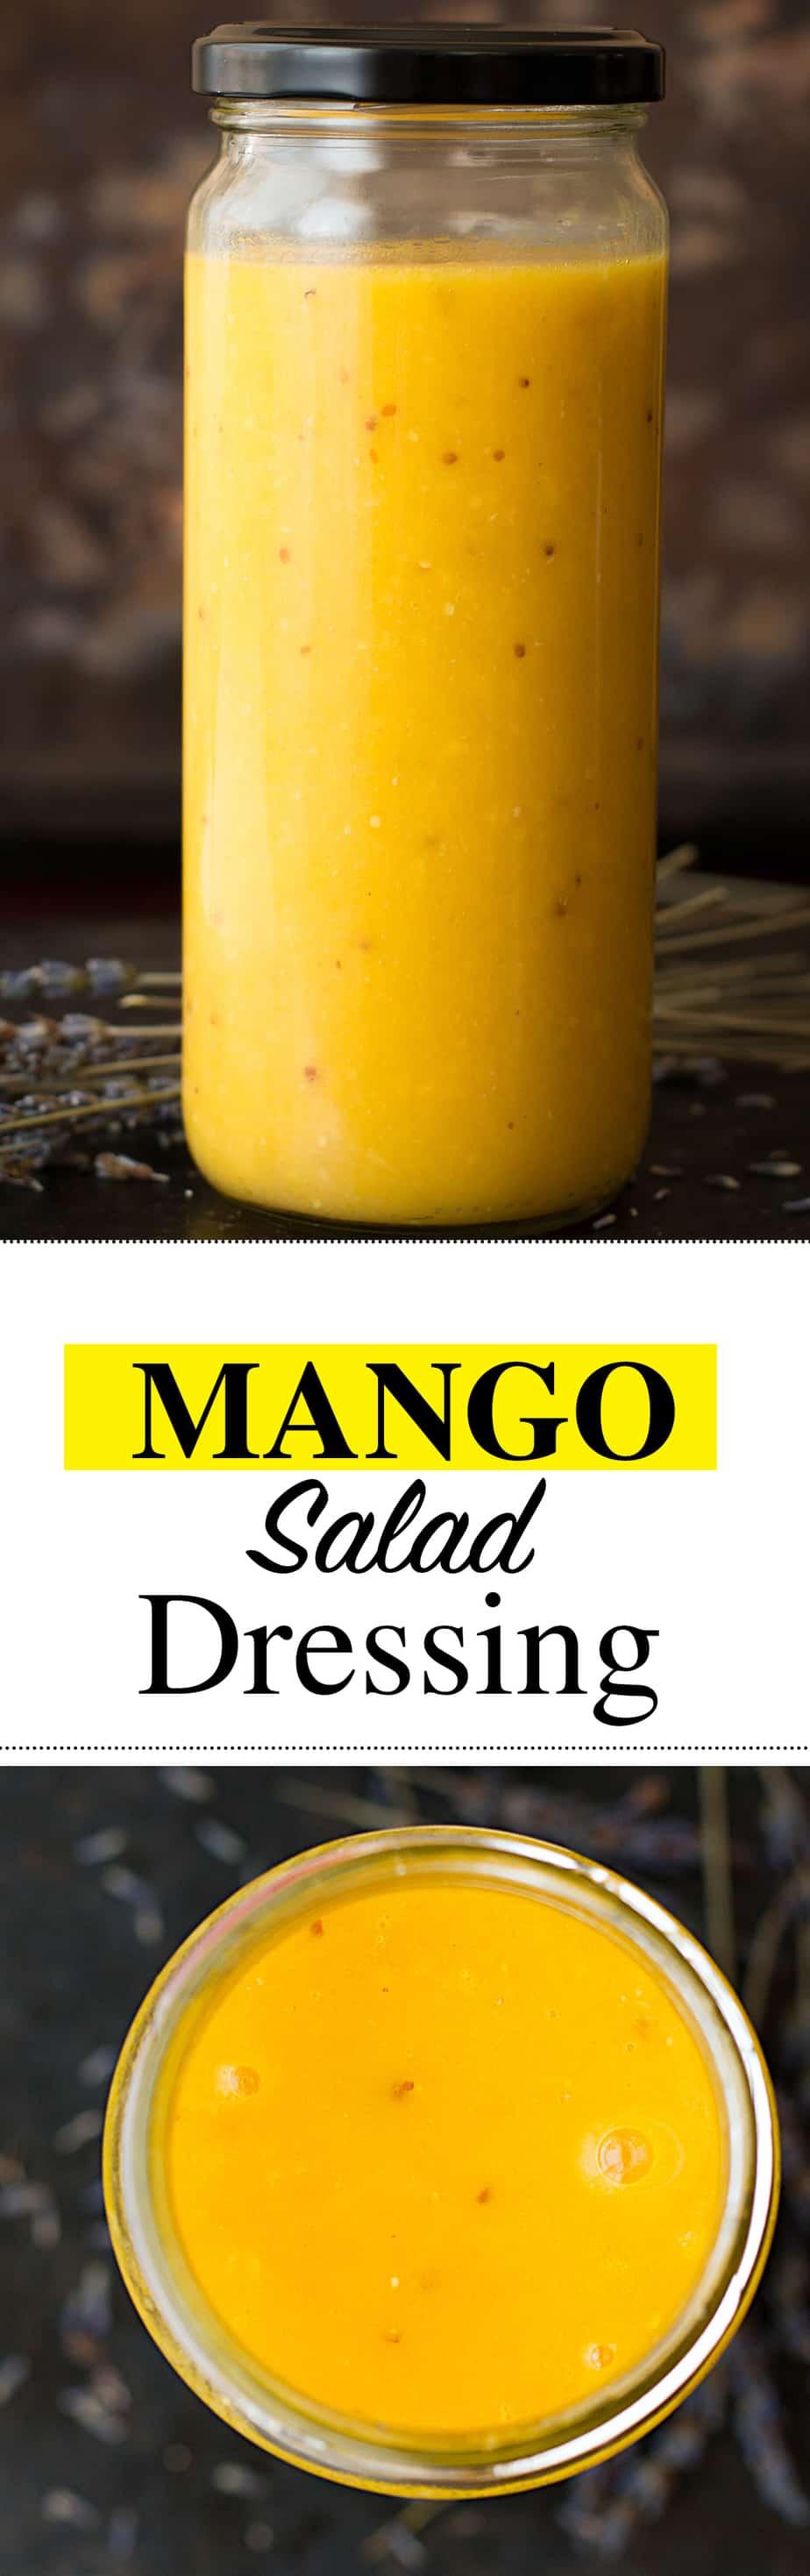 6mango dressing